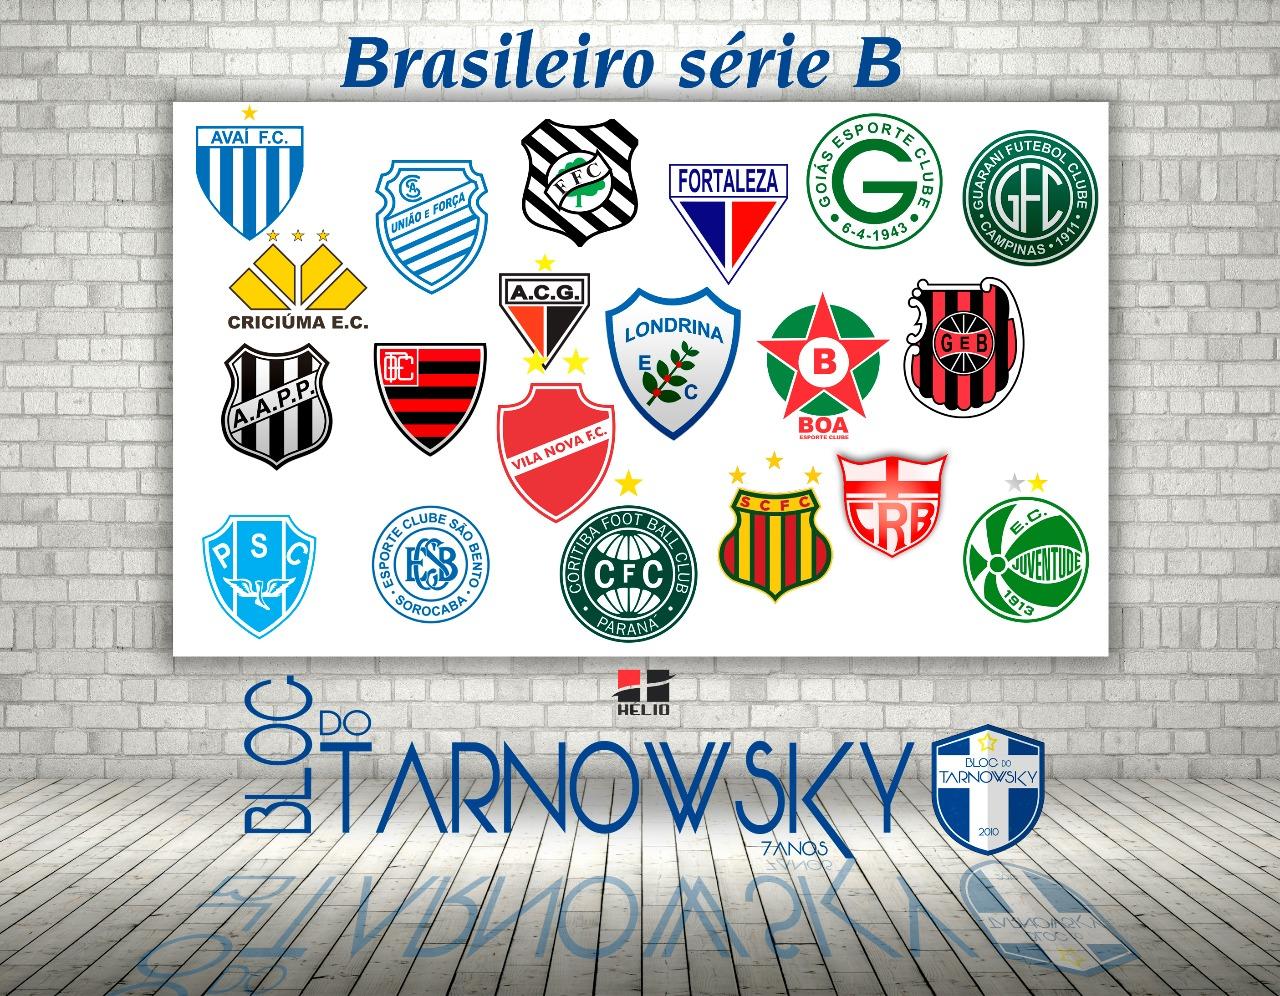 Andre Tarnowsky Brasileiro Serie B 2018 1ª Rodada Jogos De Hoje